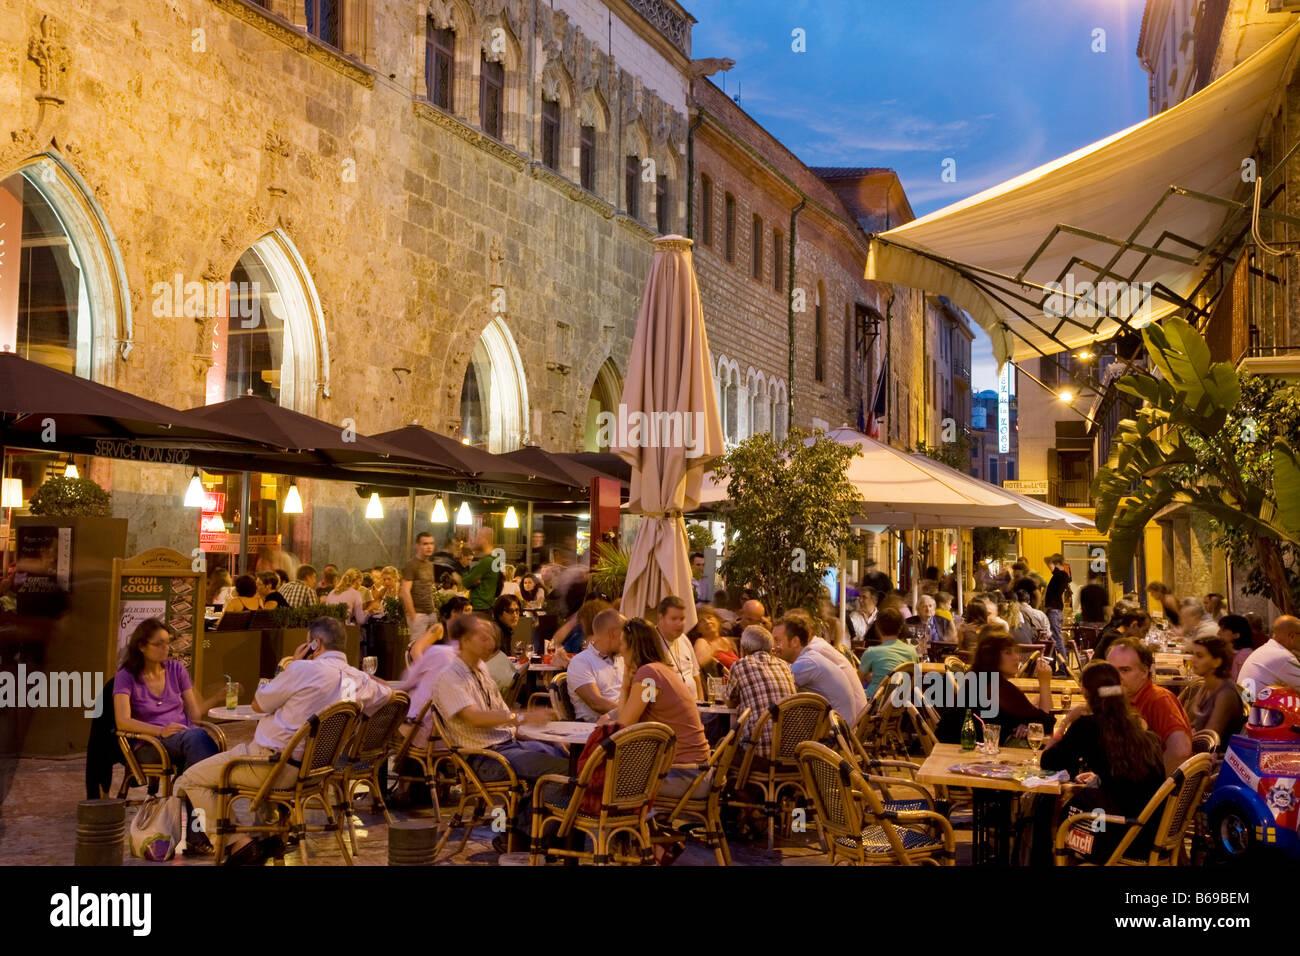 Street cafes in the south of france city center perpignan - Mobilier de france perpignan ...